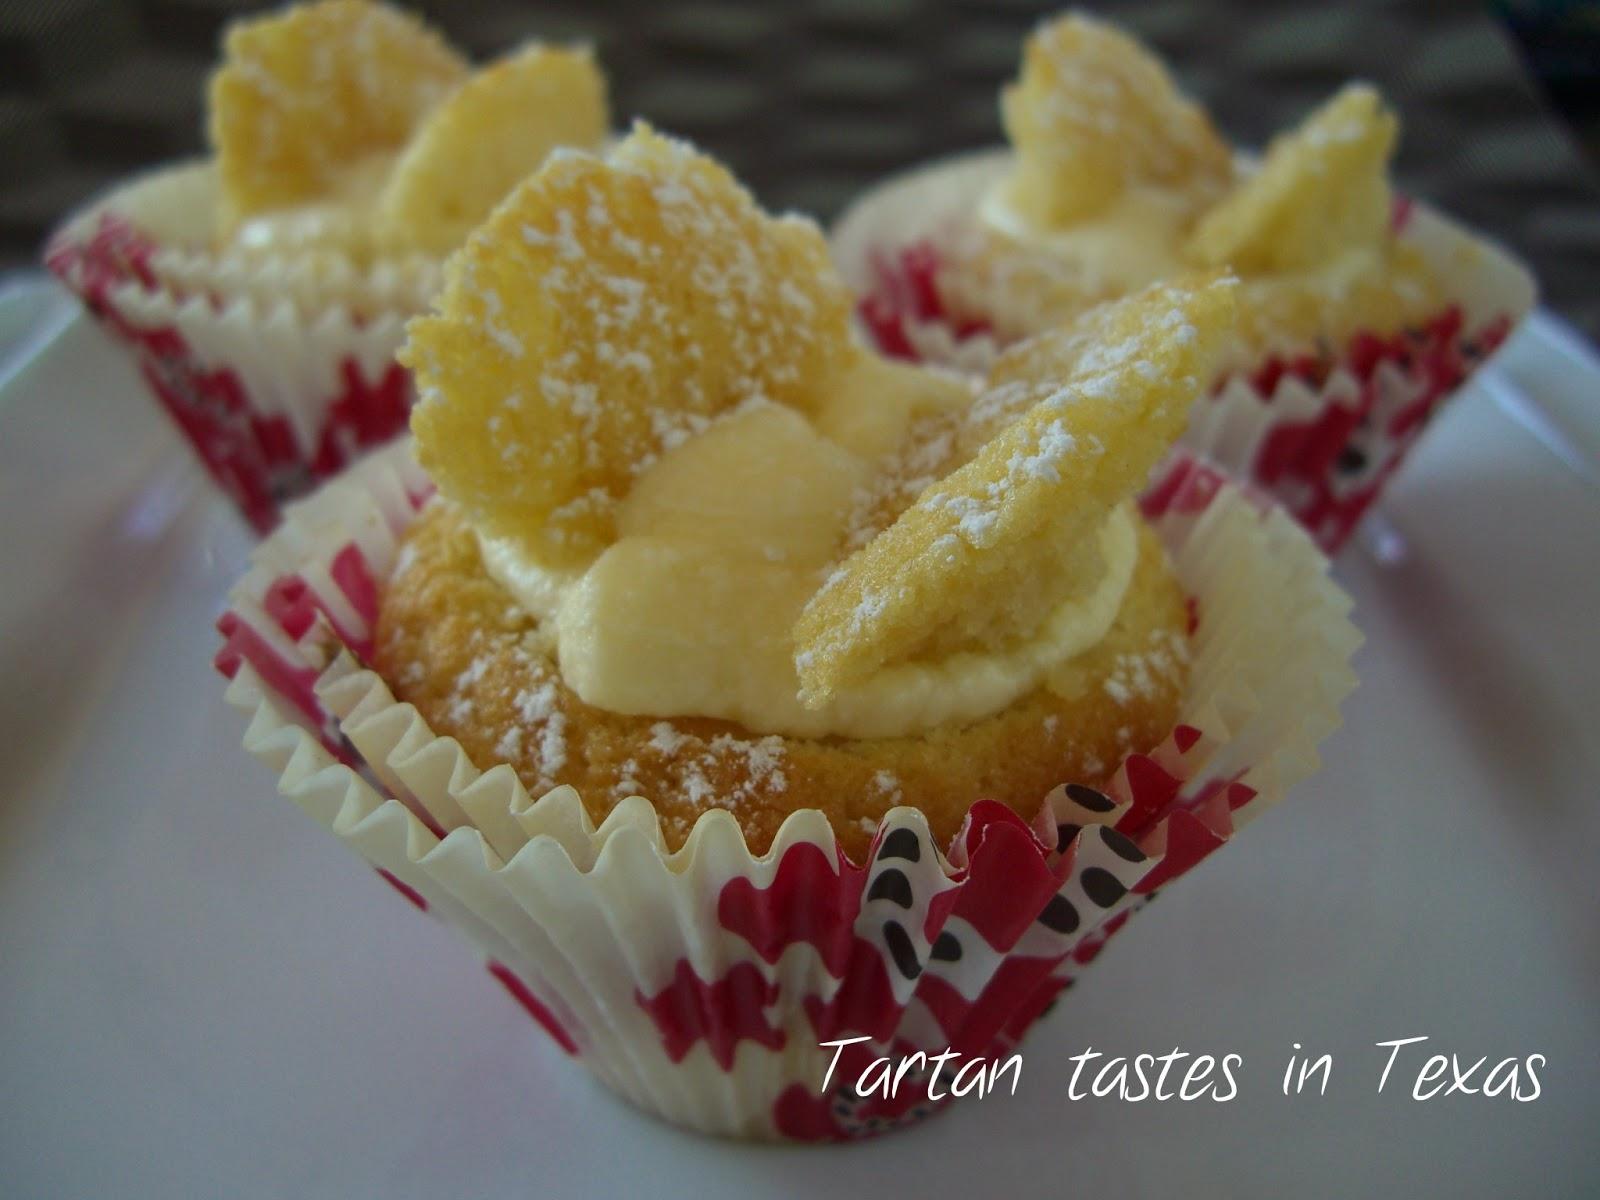 Tartan Tastes In Texas: Scottish Recipes